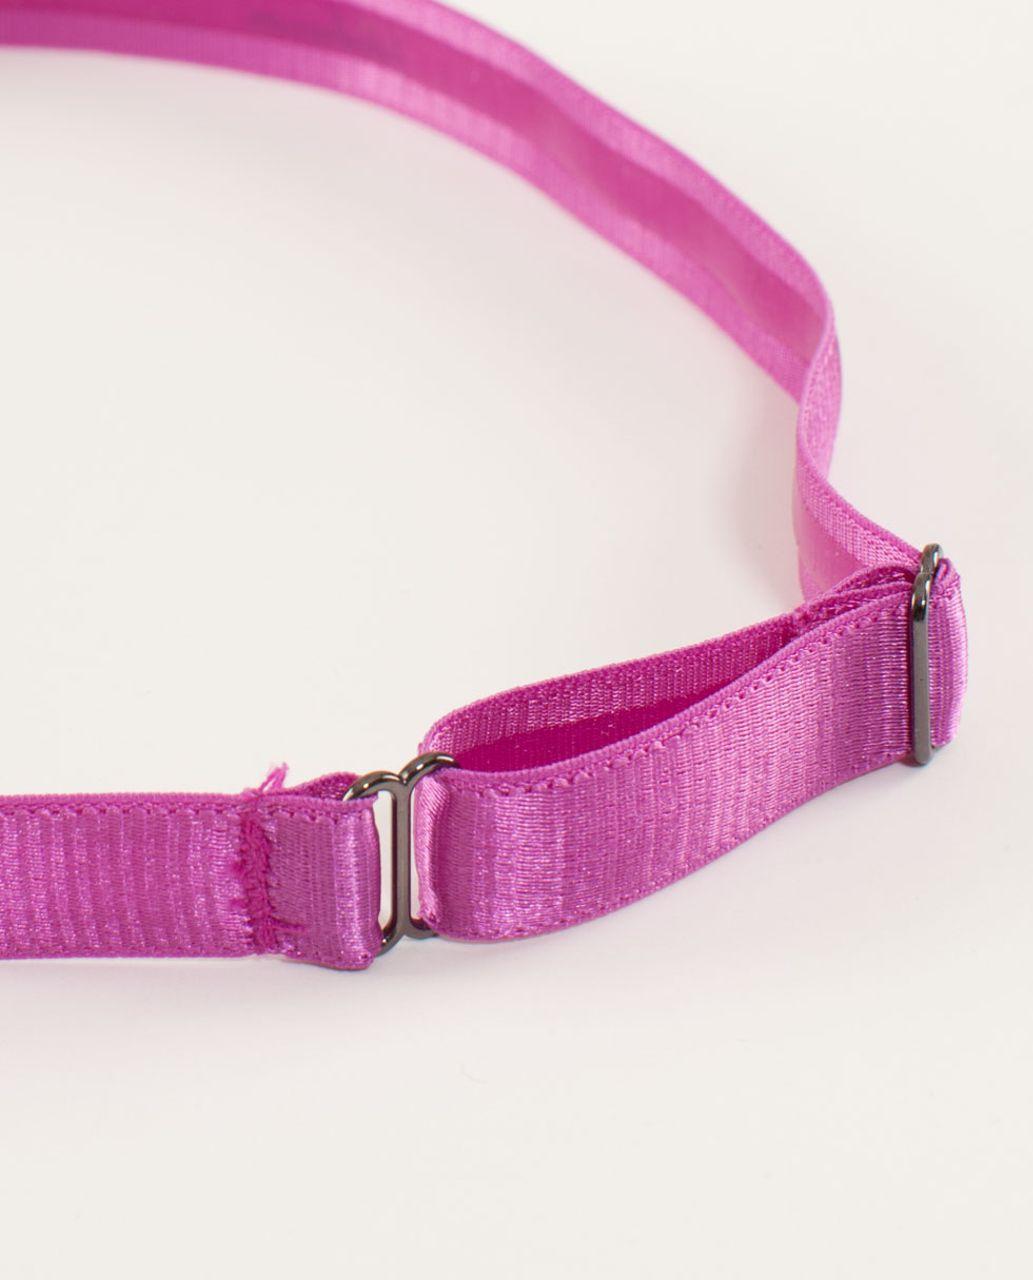 Lululemon Skinny Satin Pirouette - Ultra Violet